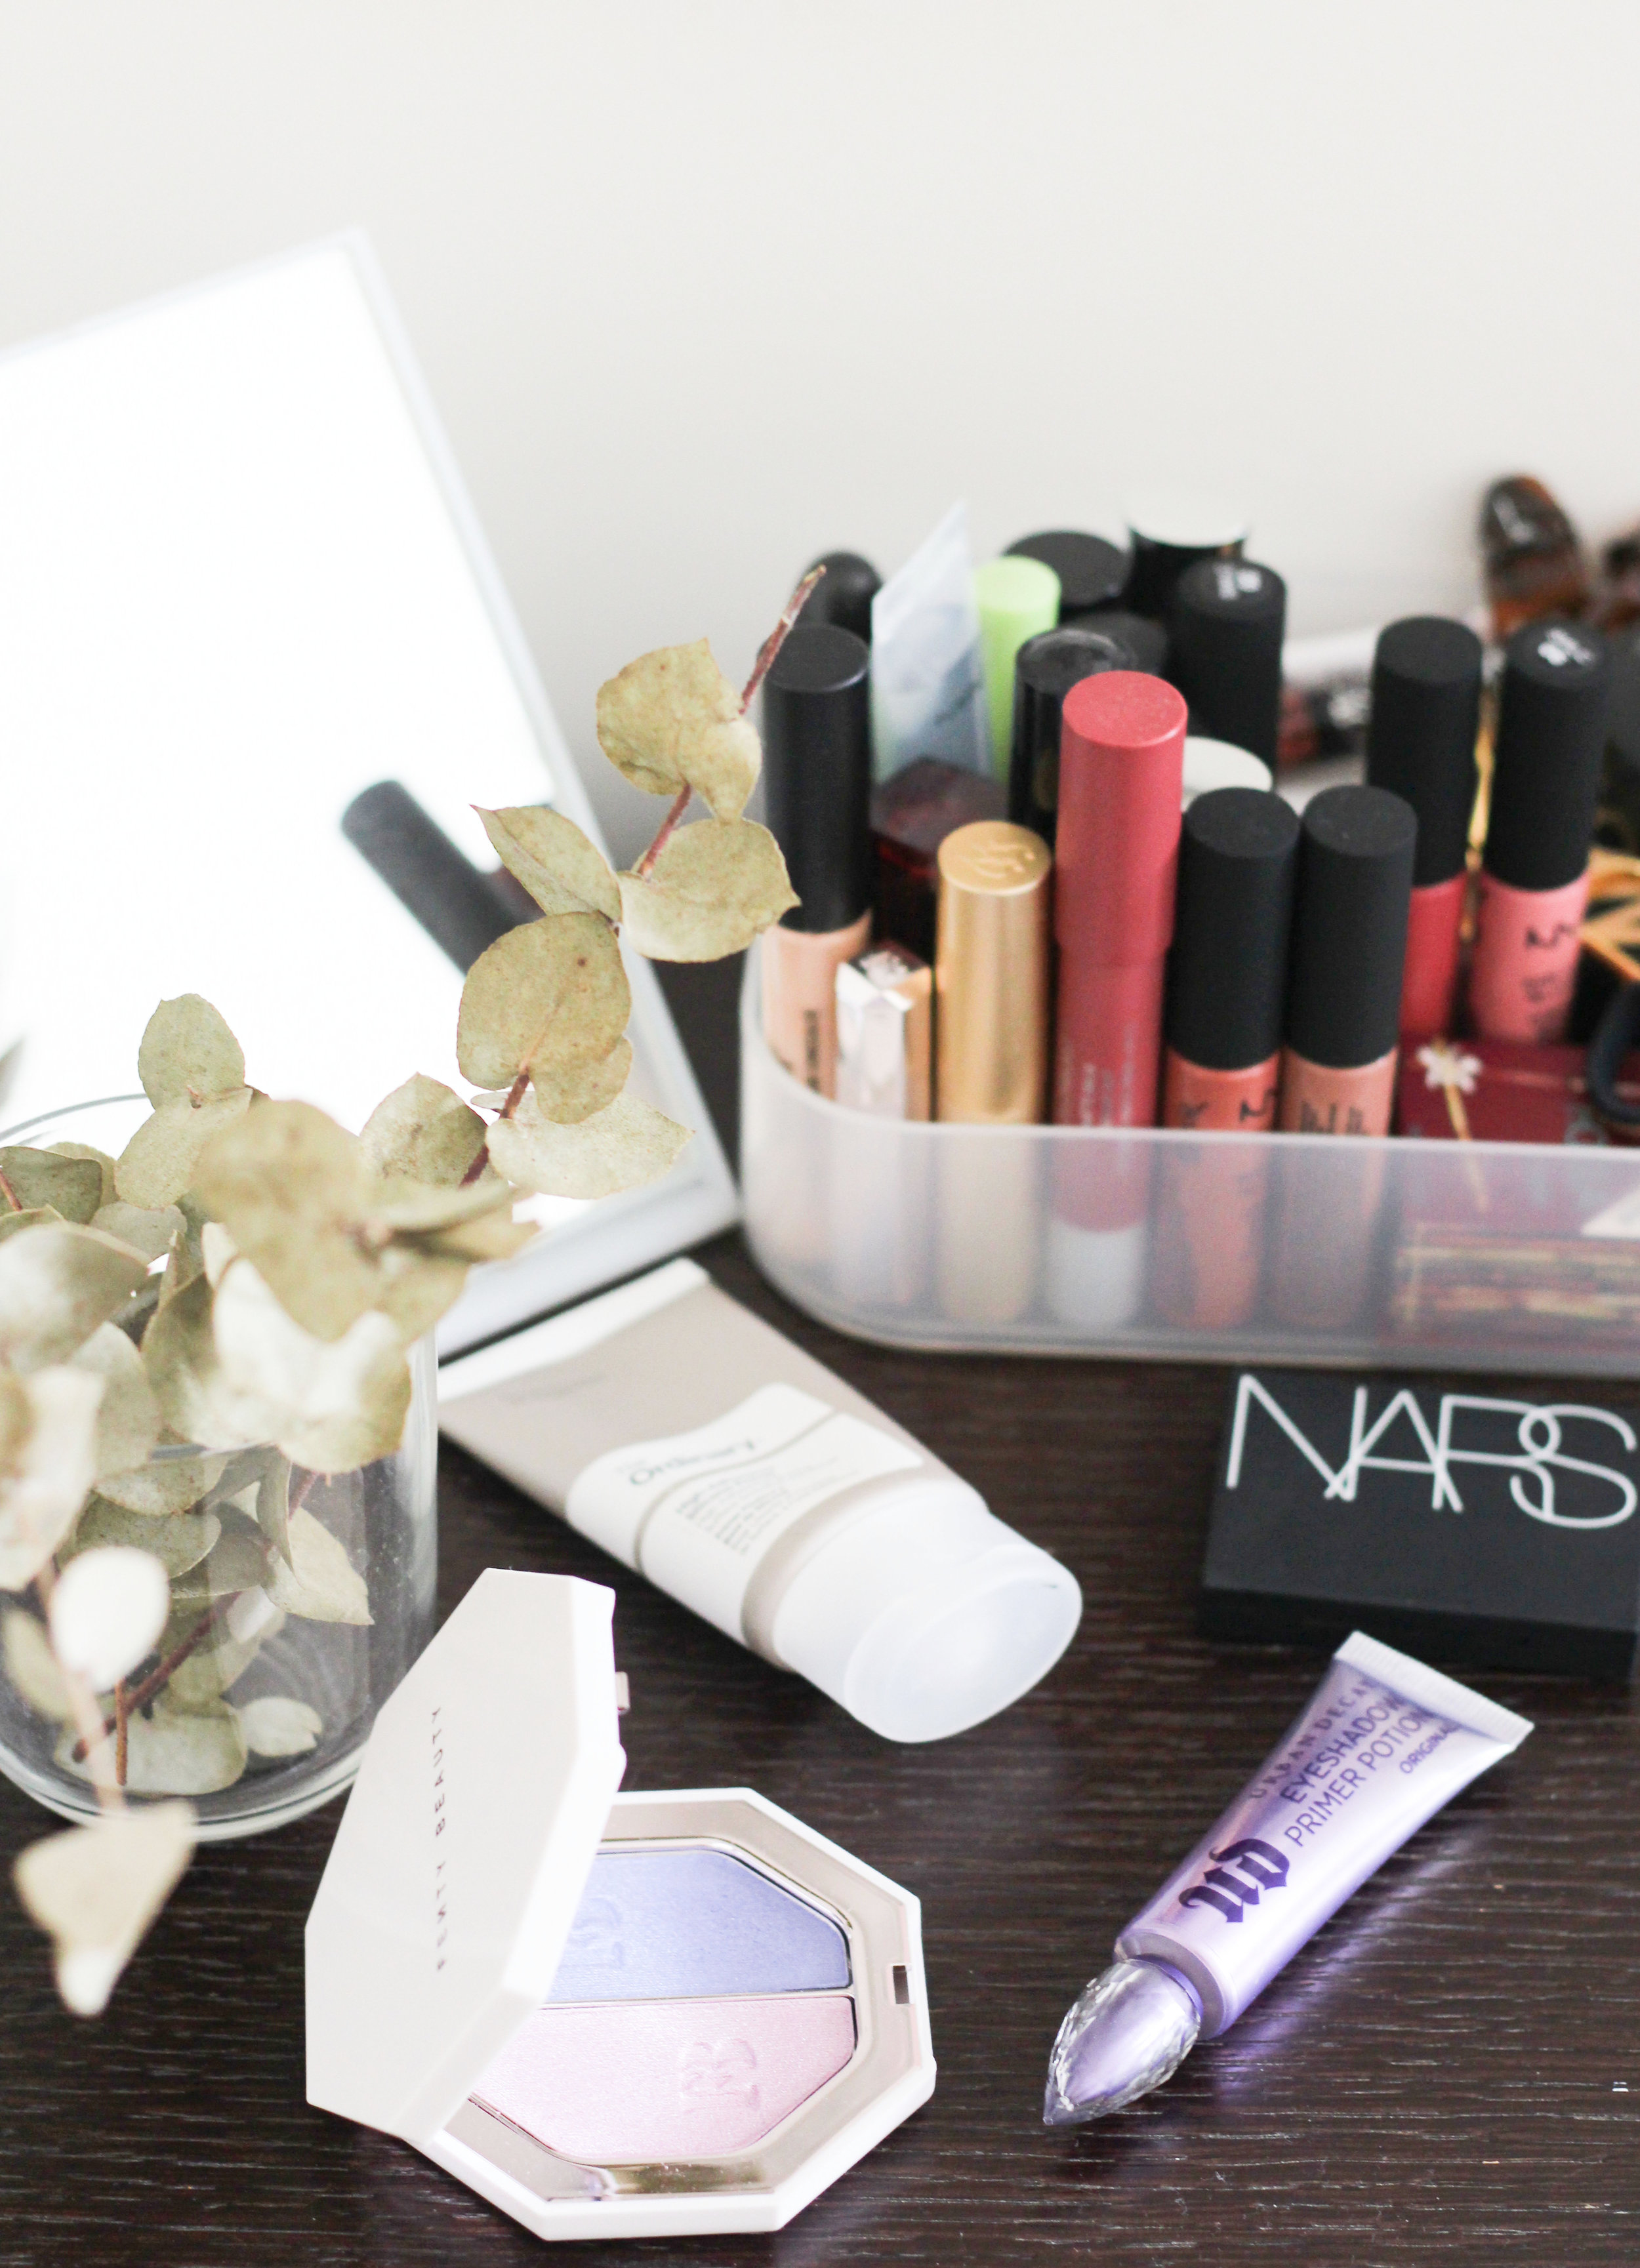 makeupcollection2.jpg